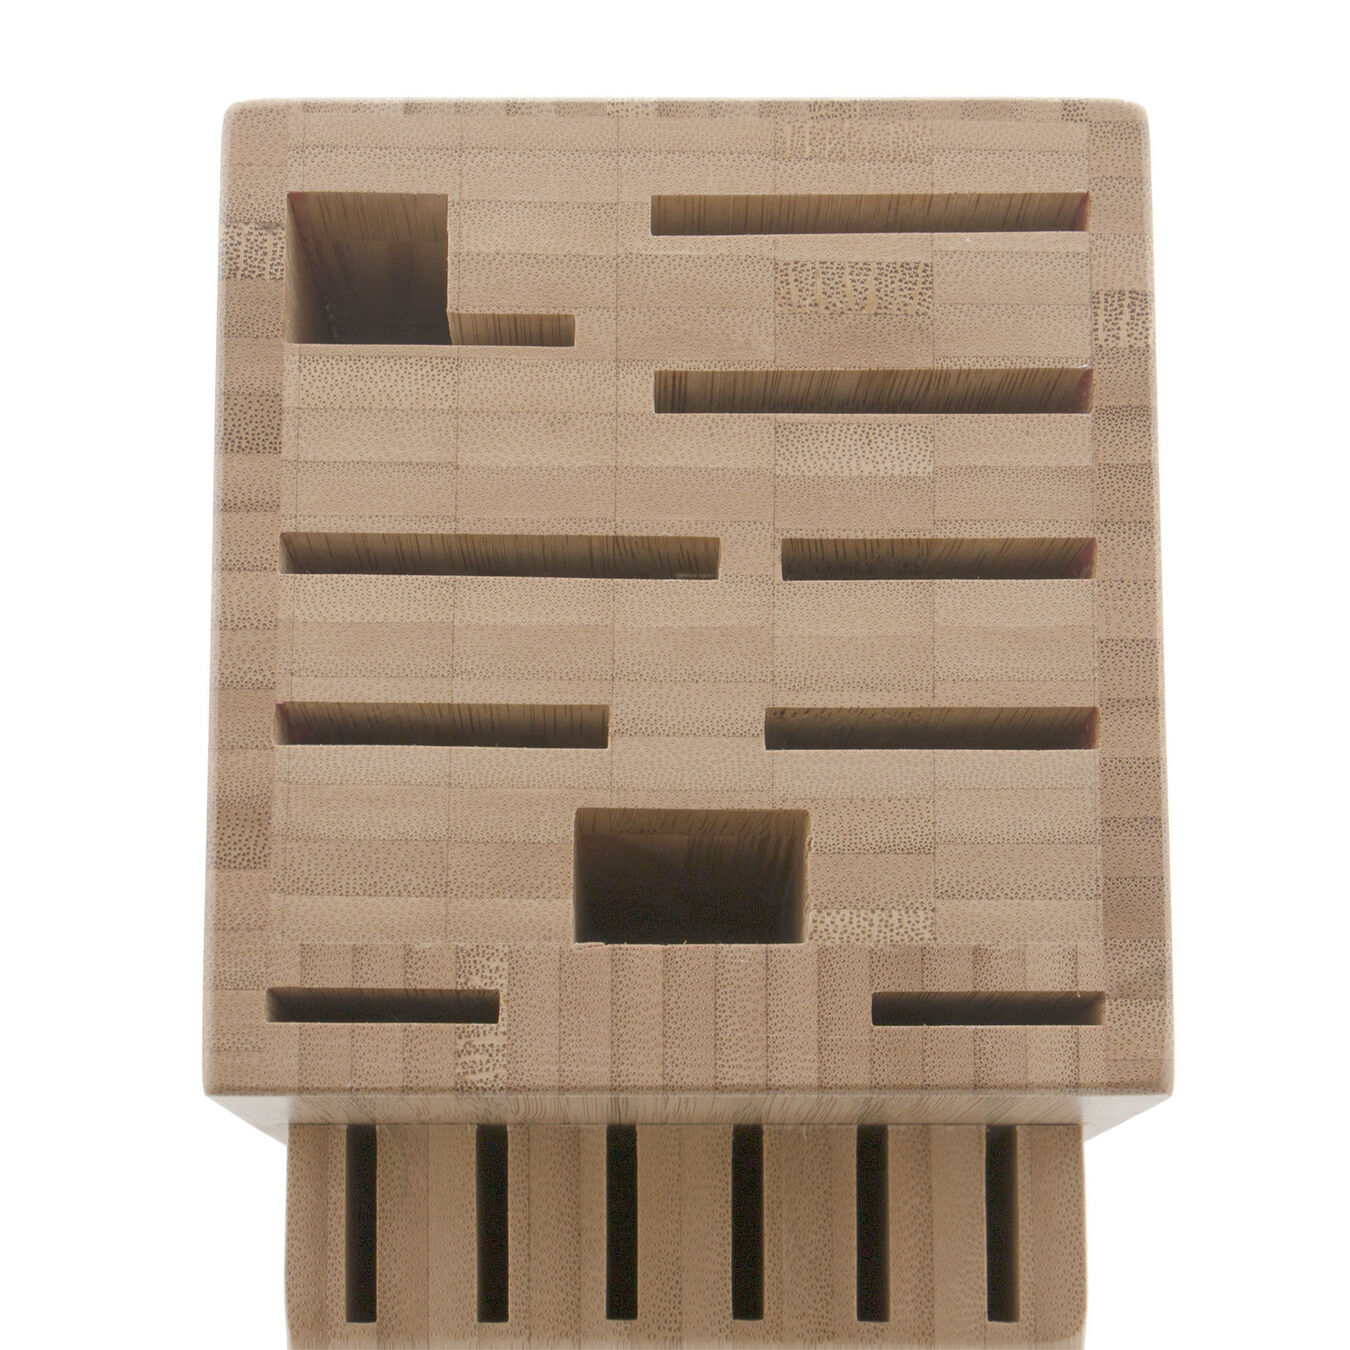 bamboo, TWIN Knife block empty,,large 3